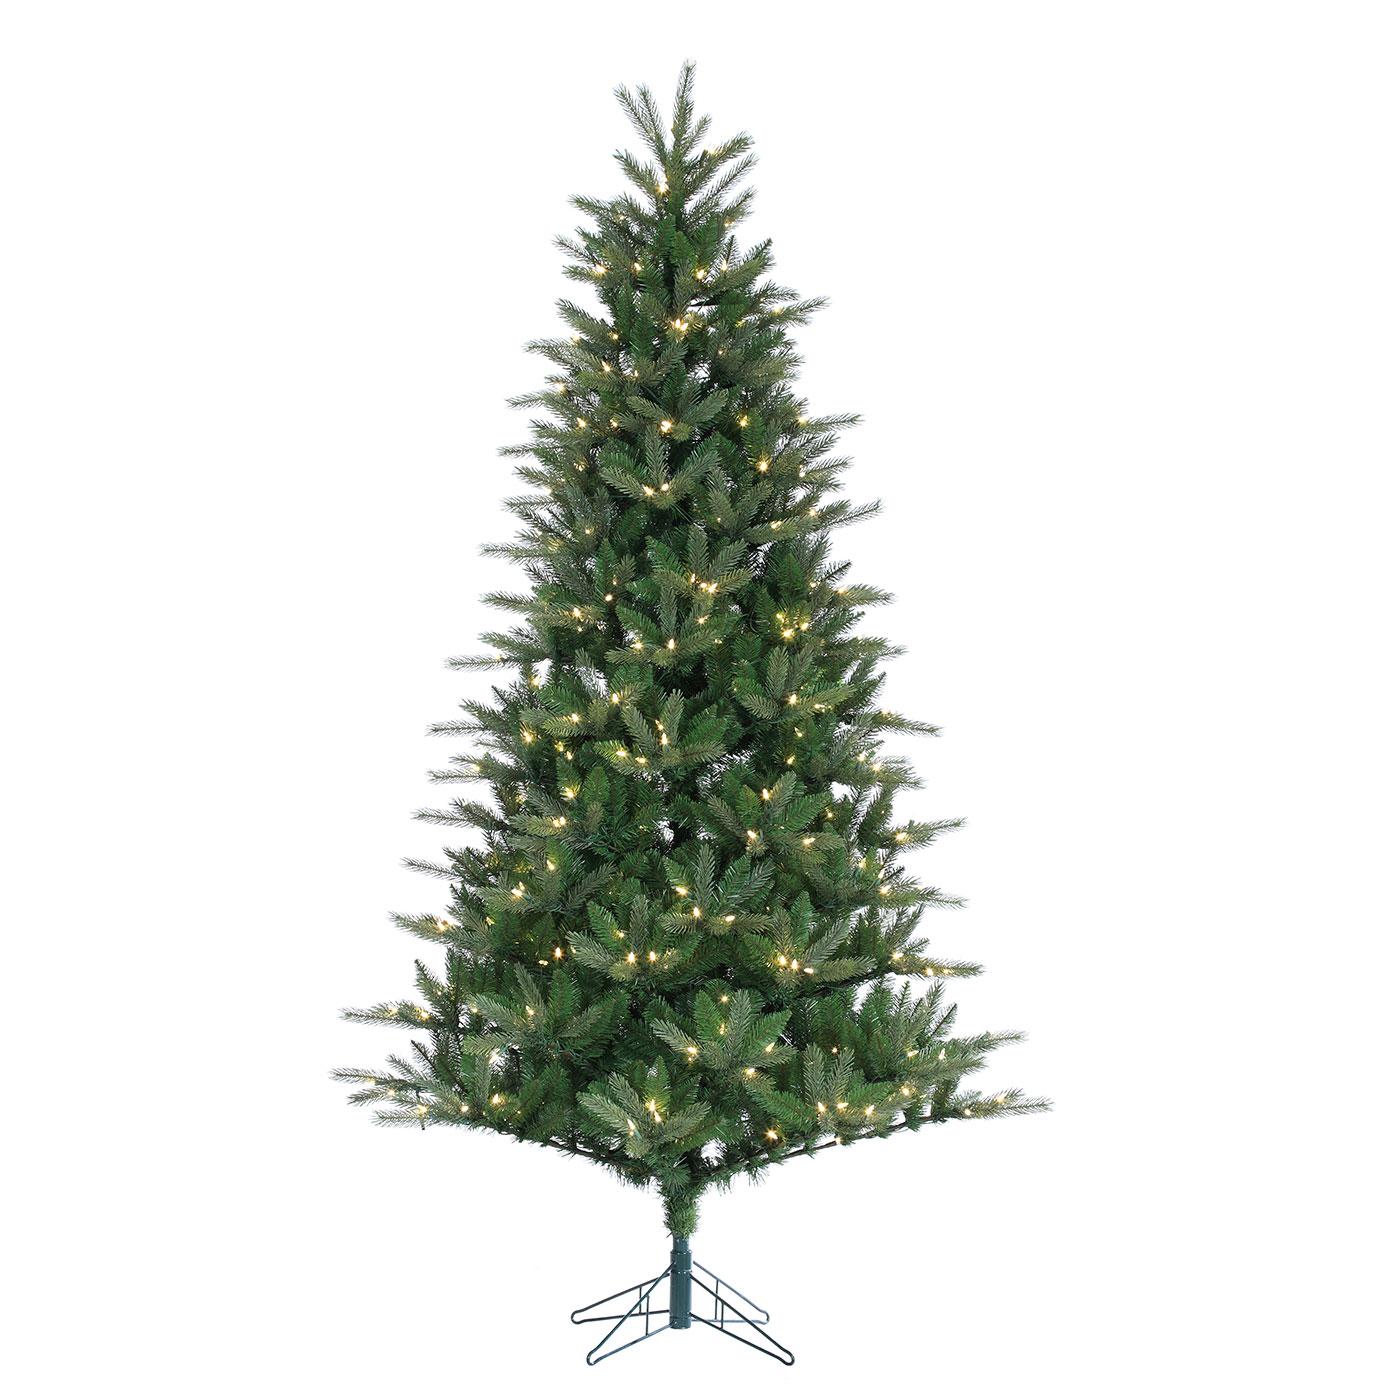 Costco Twinkling Christmas Tree: 7.5' Christmas Spruce Tree W/ Twinkling LEDs